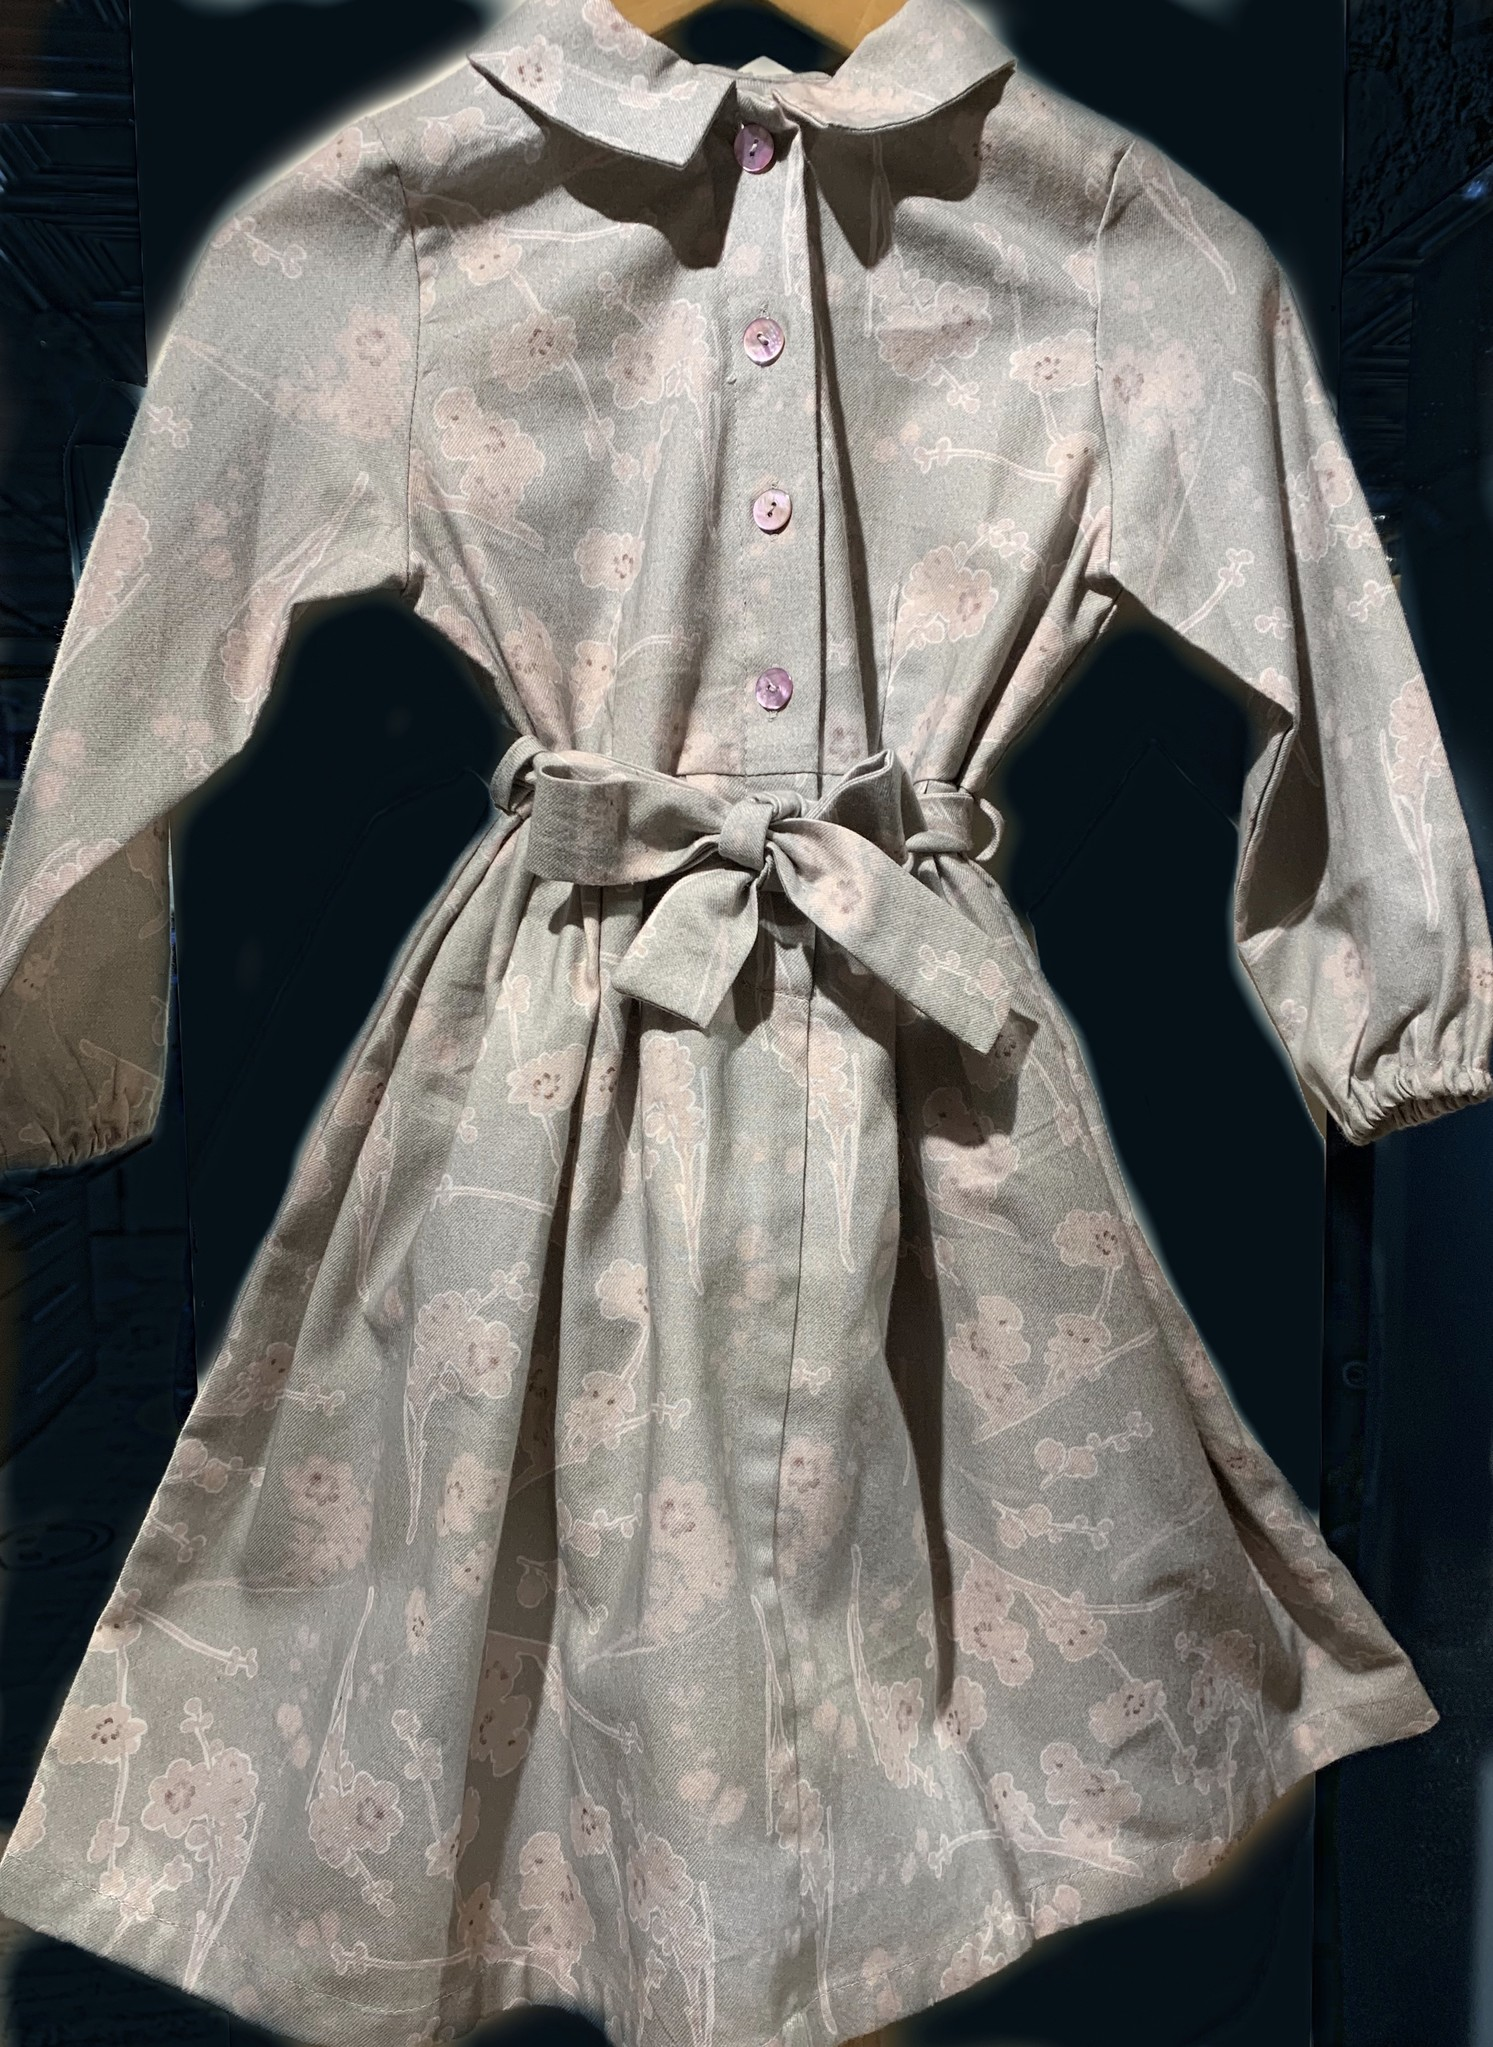 Minina Pale Violets Dress with Sash